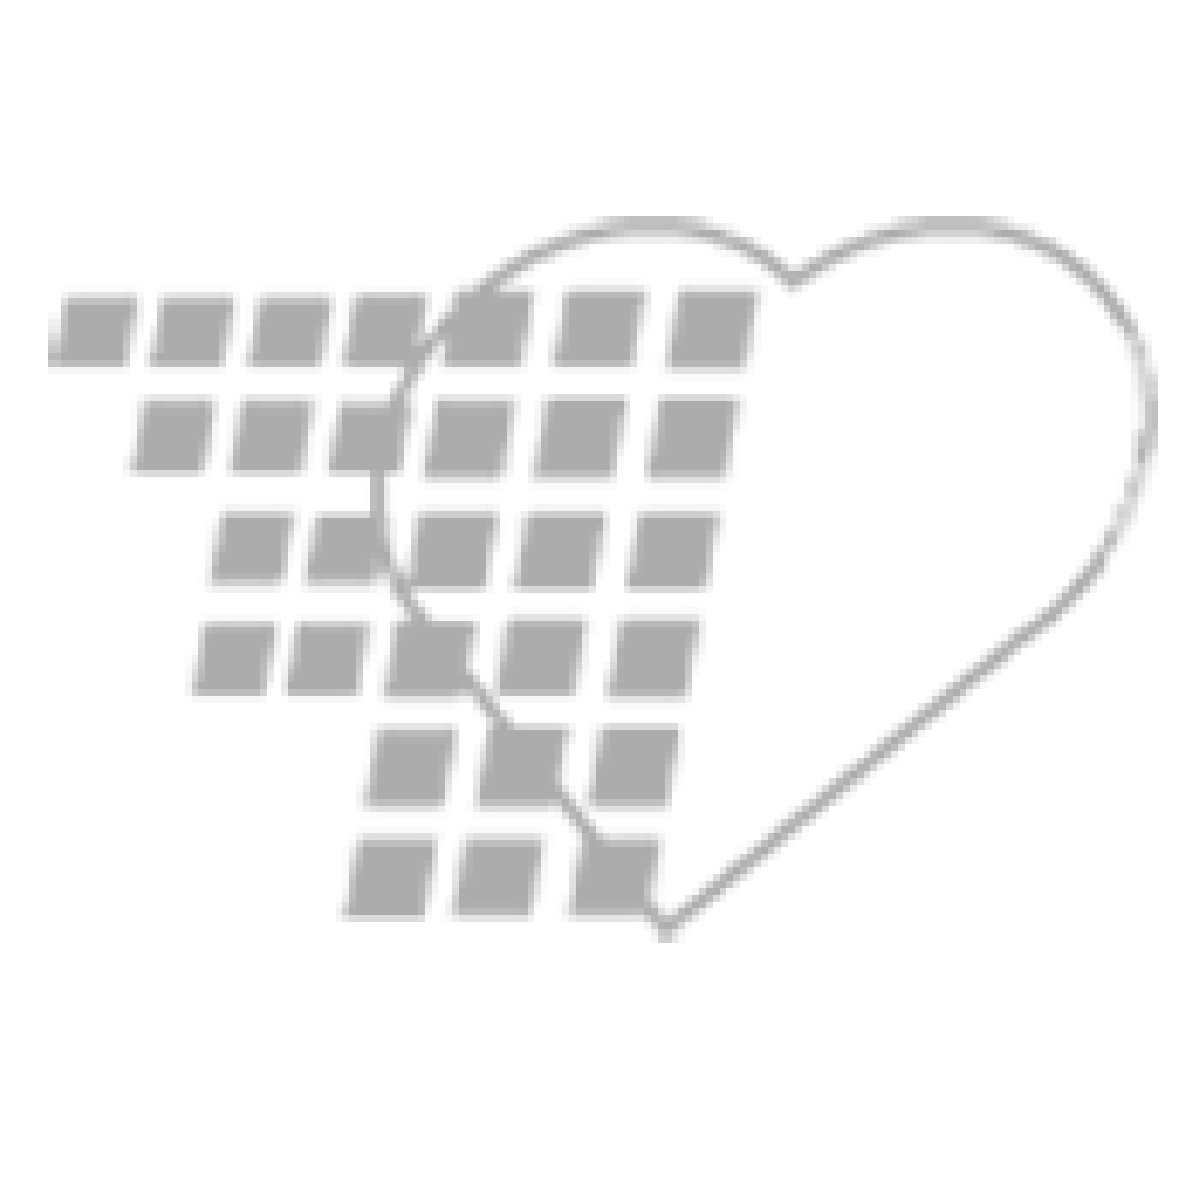 10-81-0001 Model Torso with Interchangeable Sex Organs- 24 Parts